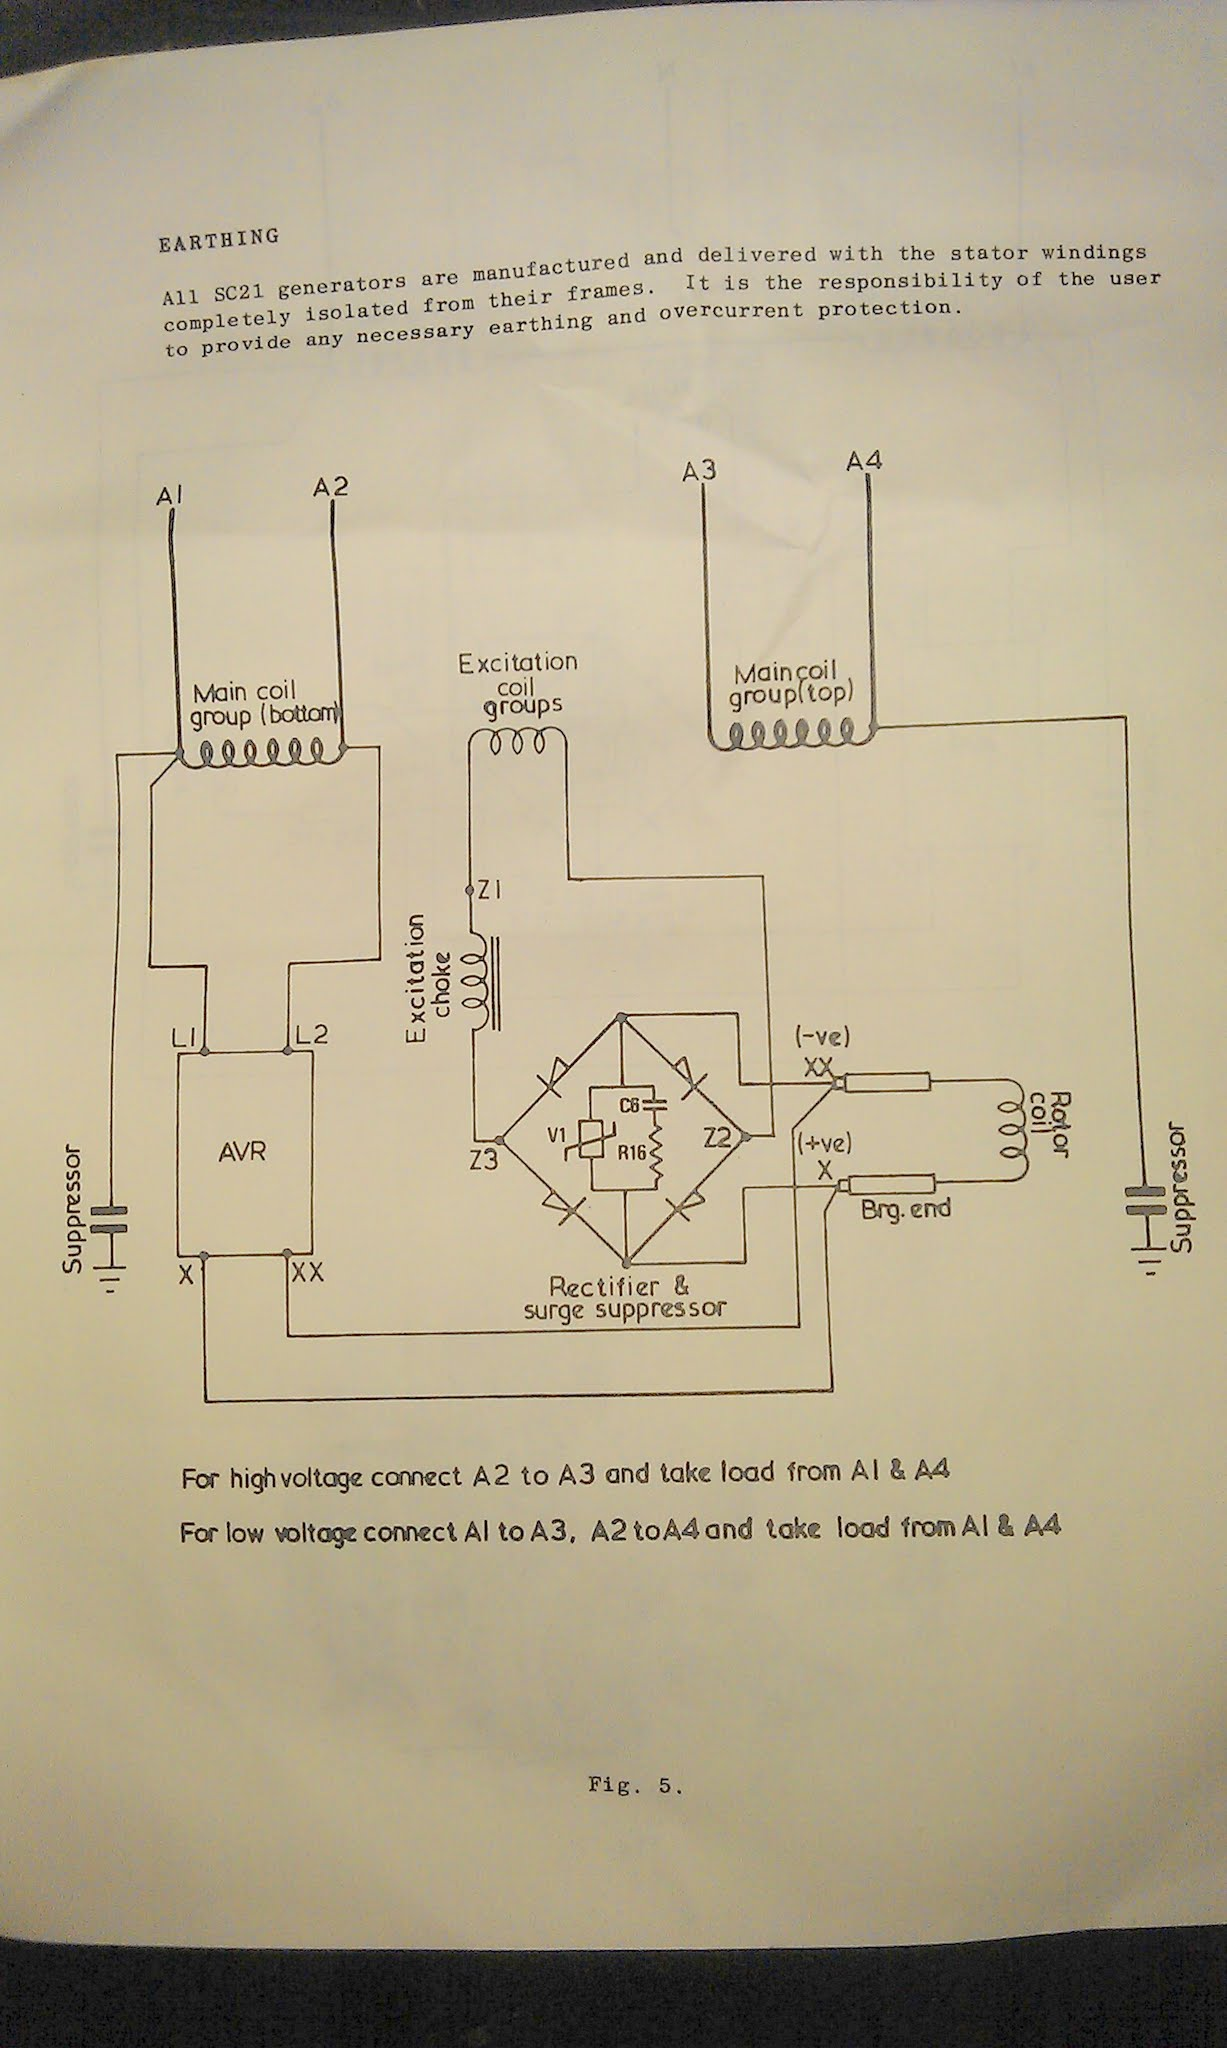 generator avr circuit diagram blank plant and animal cell venn 5 phase bridge rectifier regulator